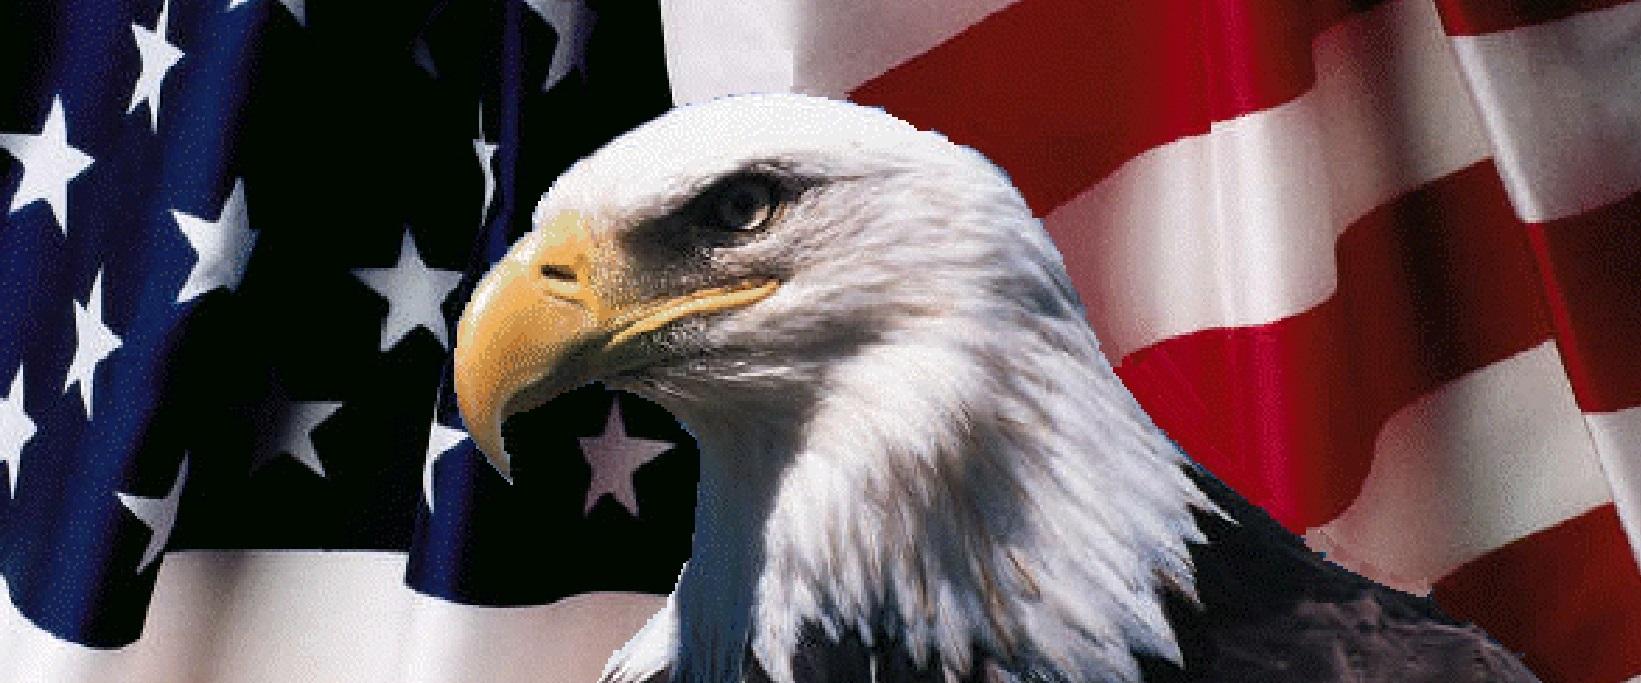 american-flag-and-eagle-2a